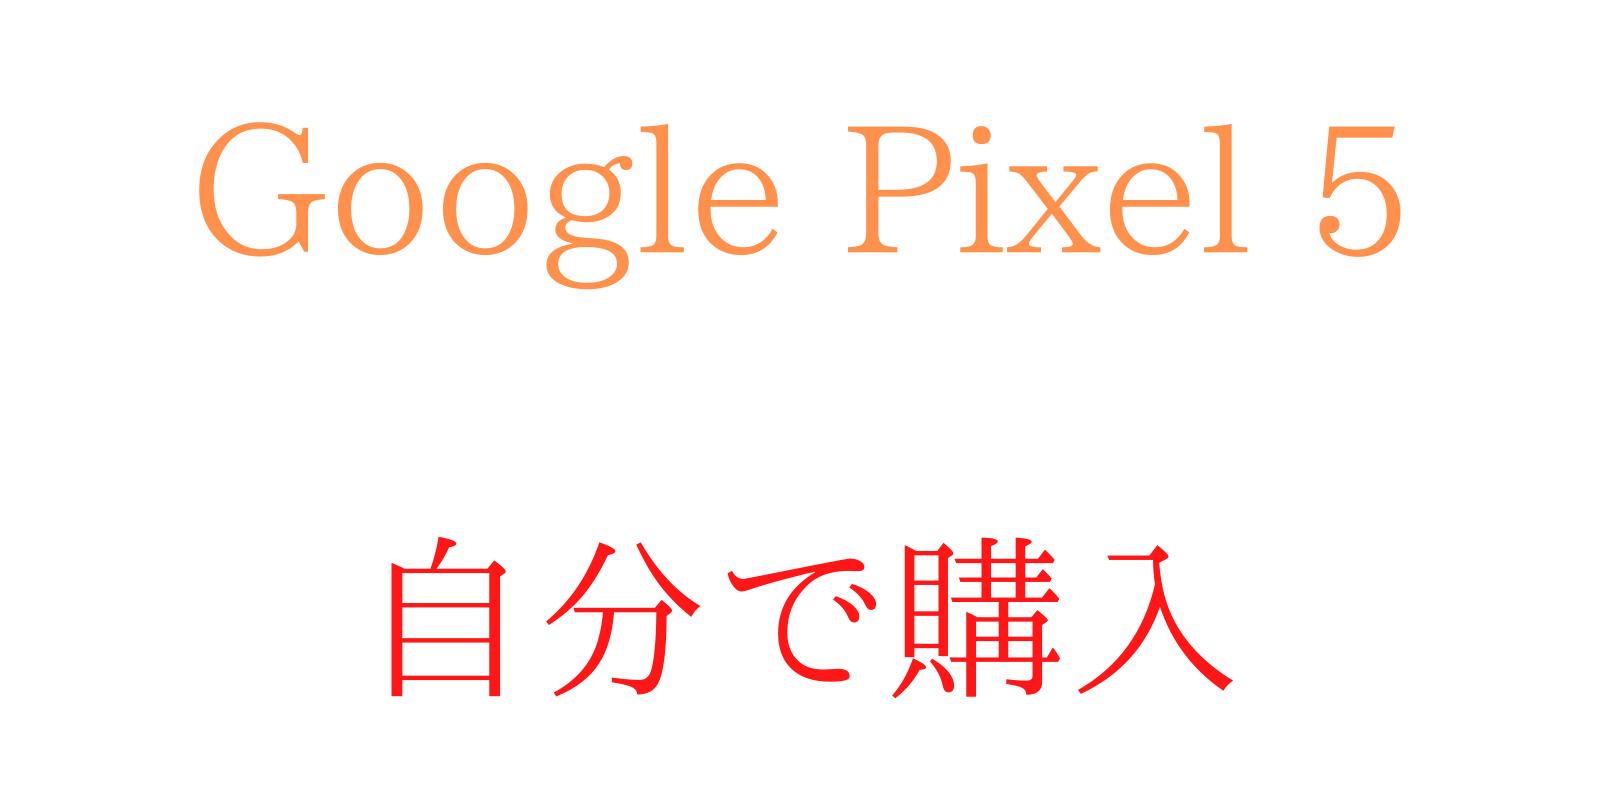 Pixel 5は自分で購入(用意)